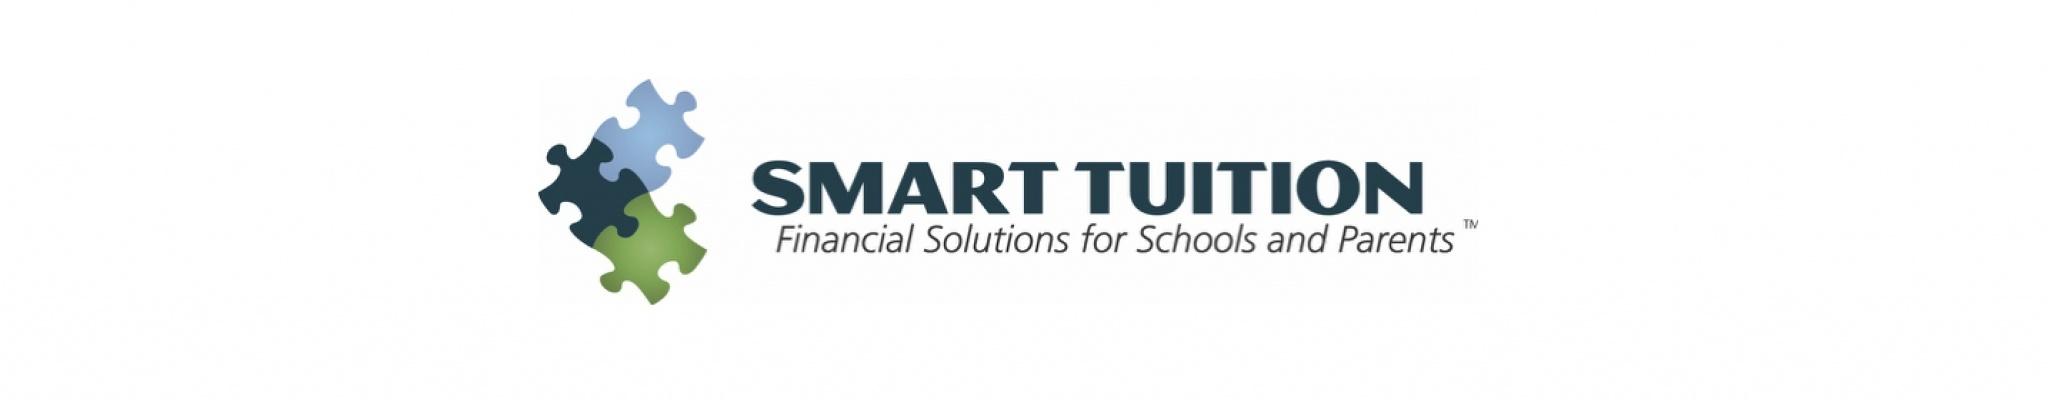 Smart Tuition: Intelligent School Financial Management